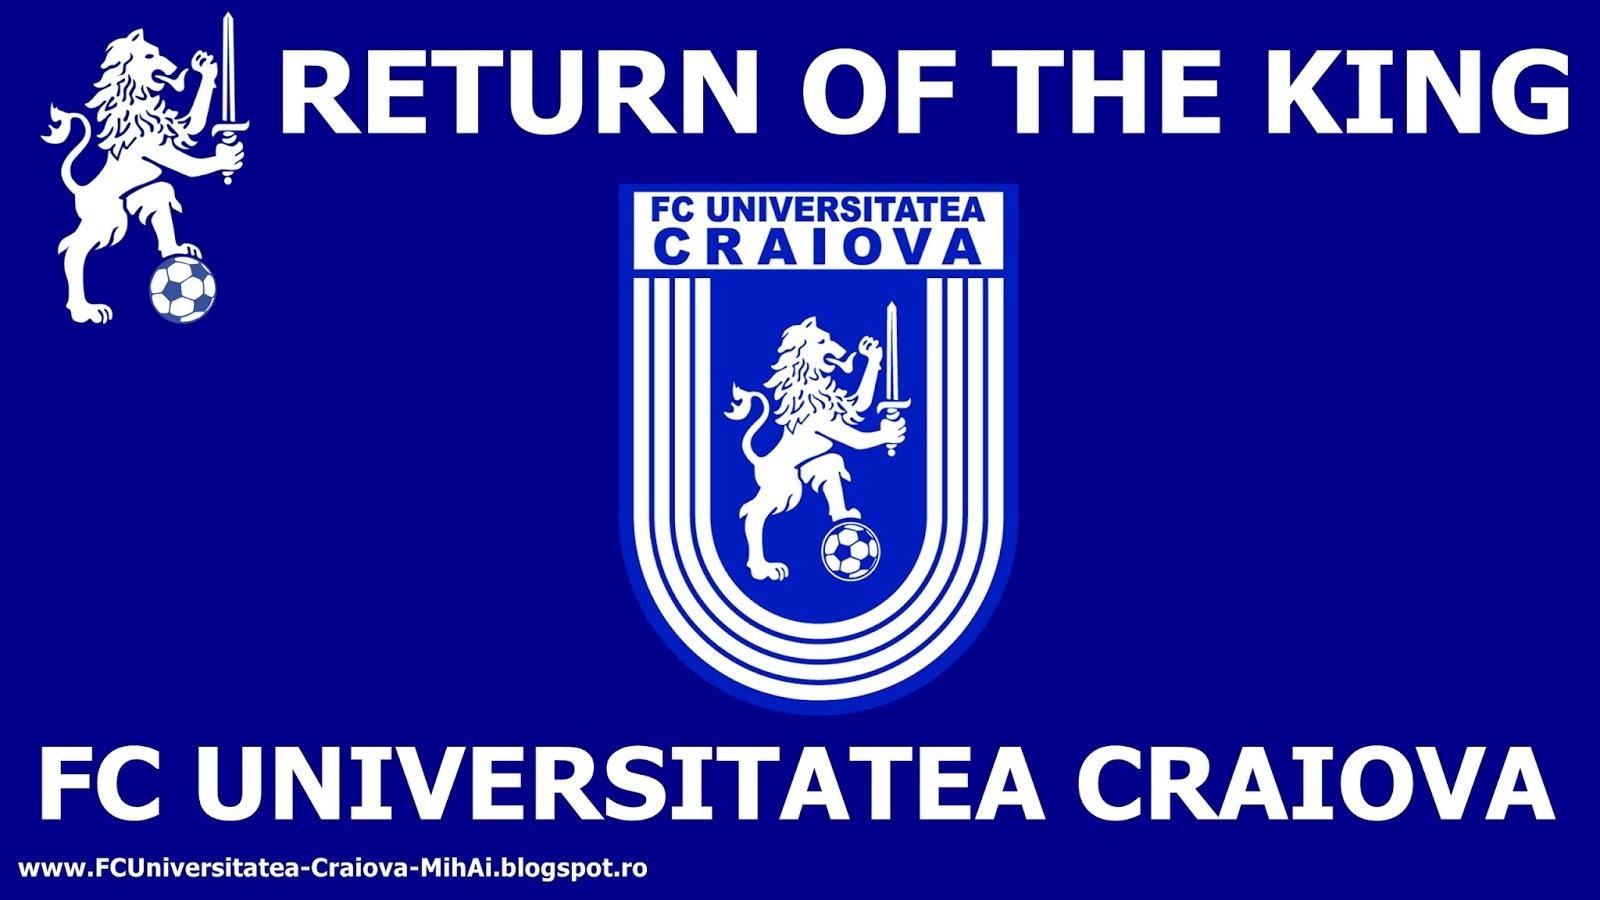 ❤ FC UNIVERSITATEA CRAIOVA - Wallpapers ALB - ALBASTRU